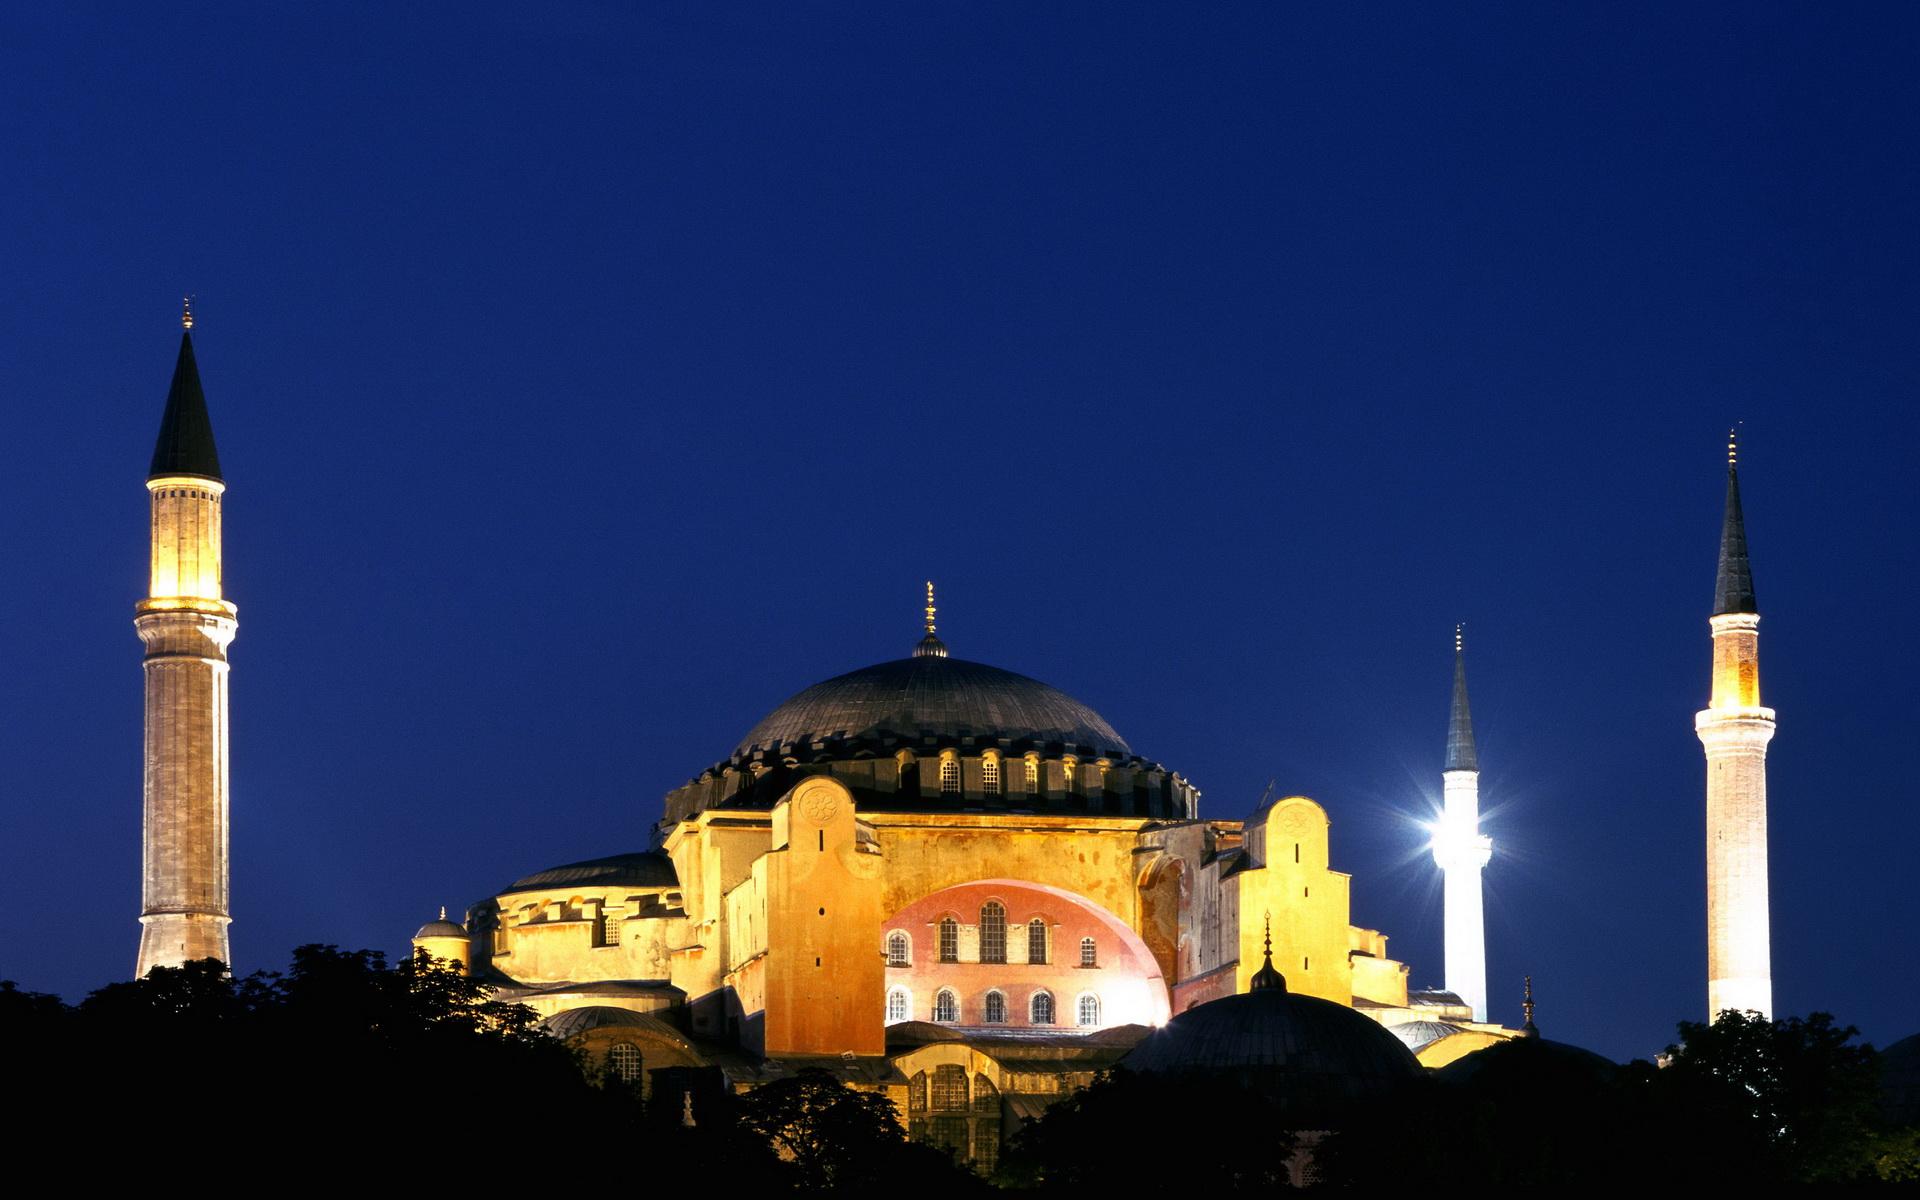 Islamic Wallpaper Hd Download Full The Blue Mosque Sultanahmet Quarter Istanbul Turkey